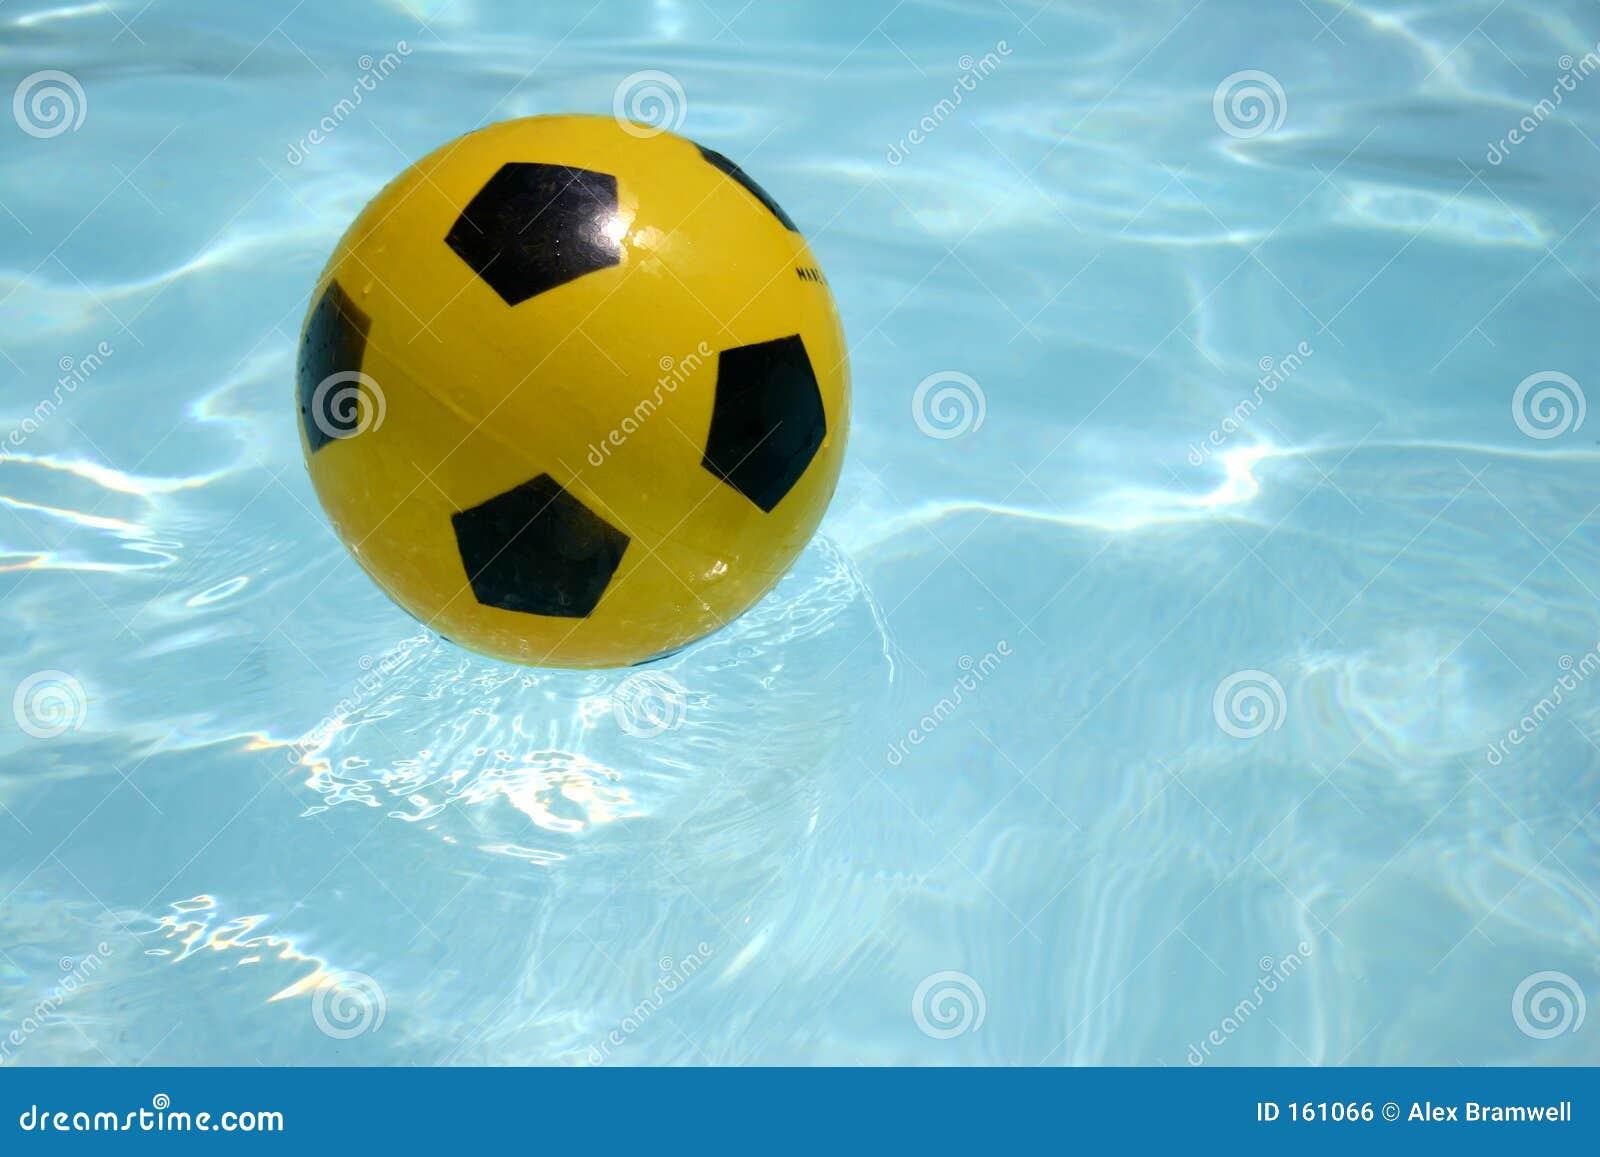 Yellow ball floating